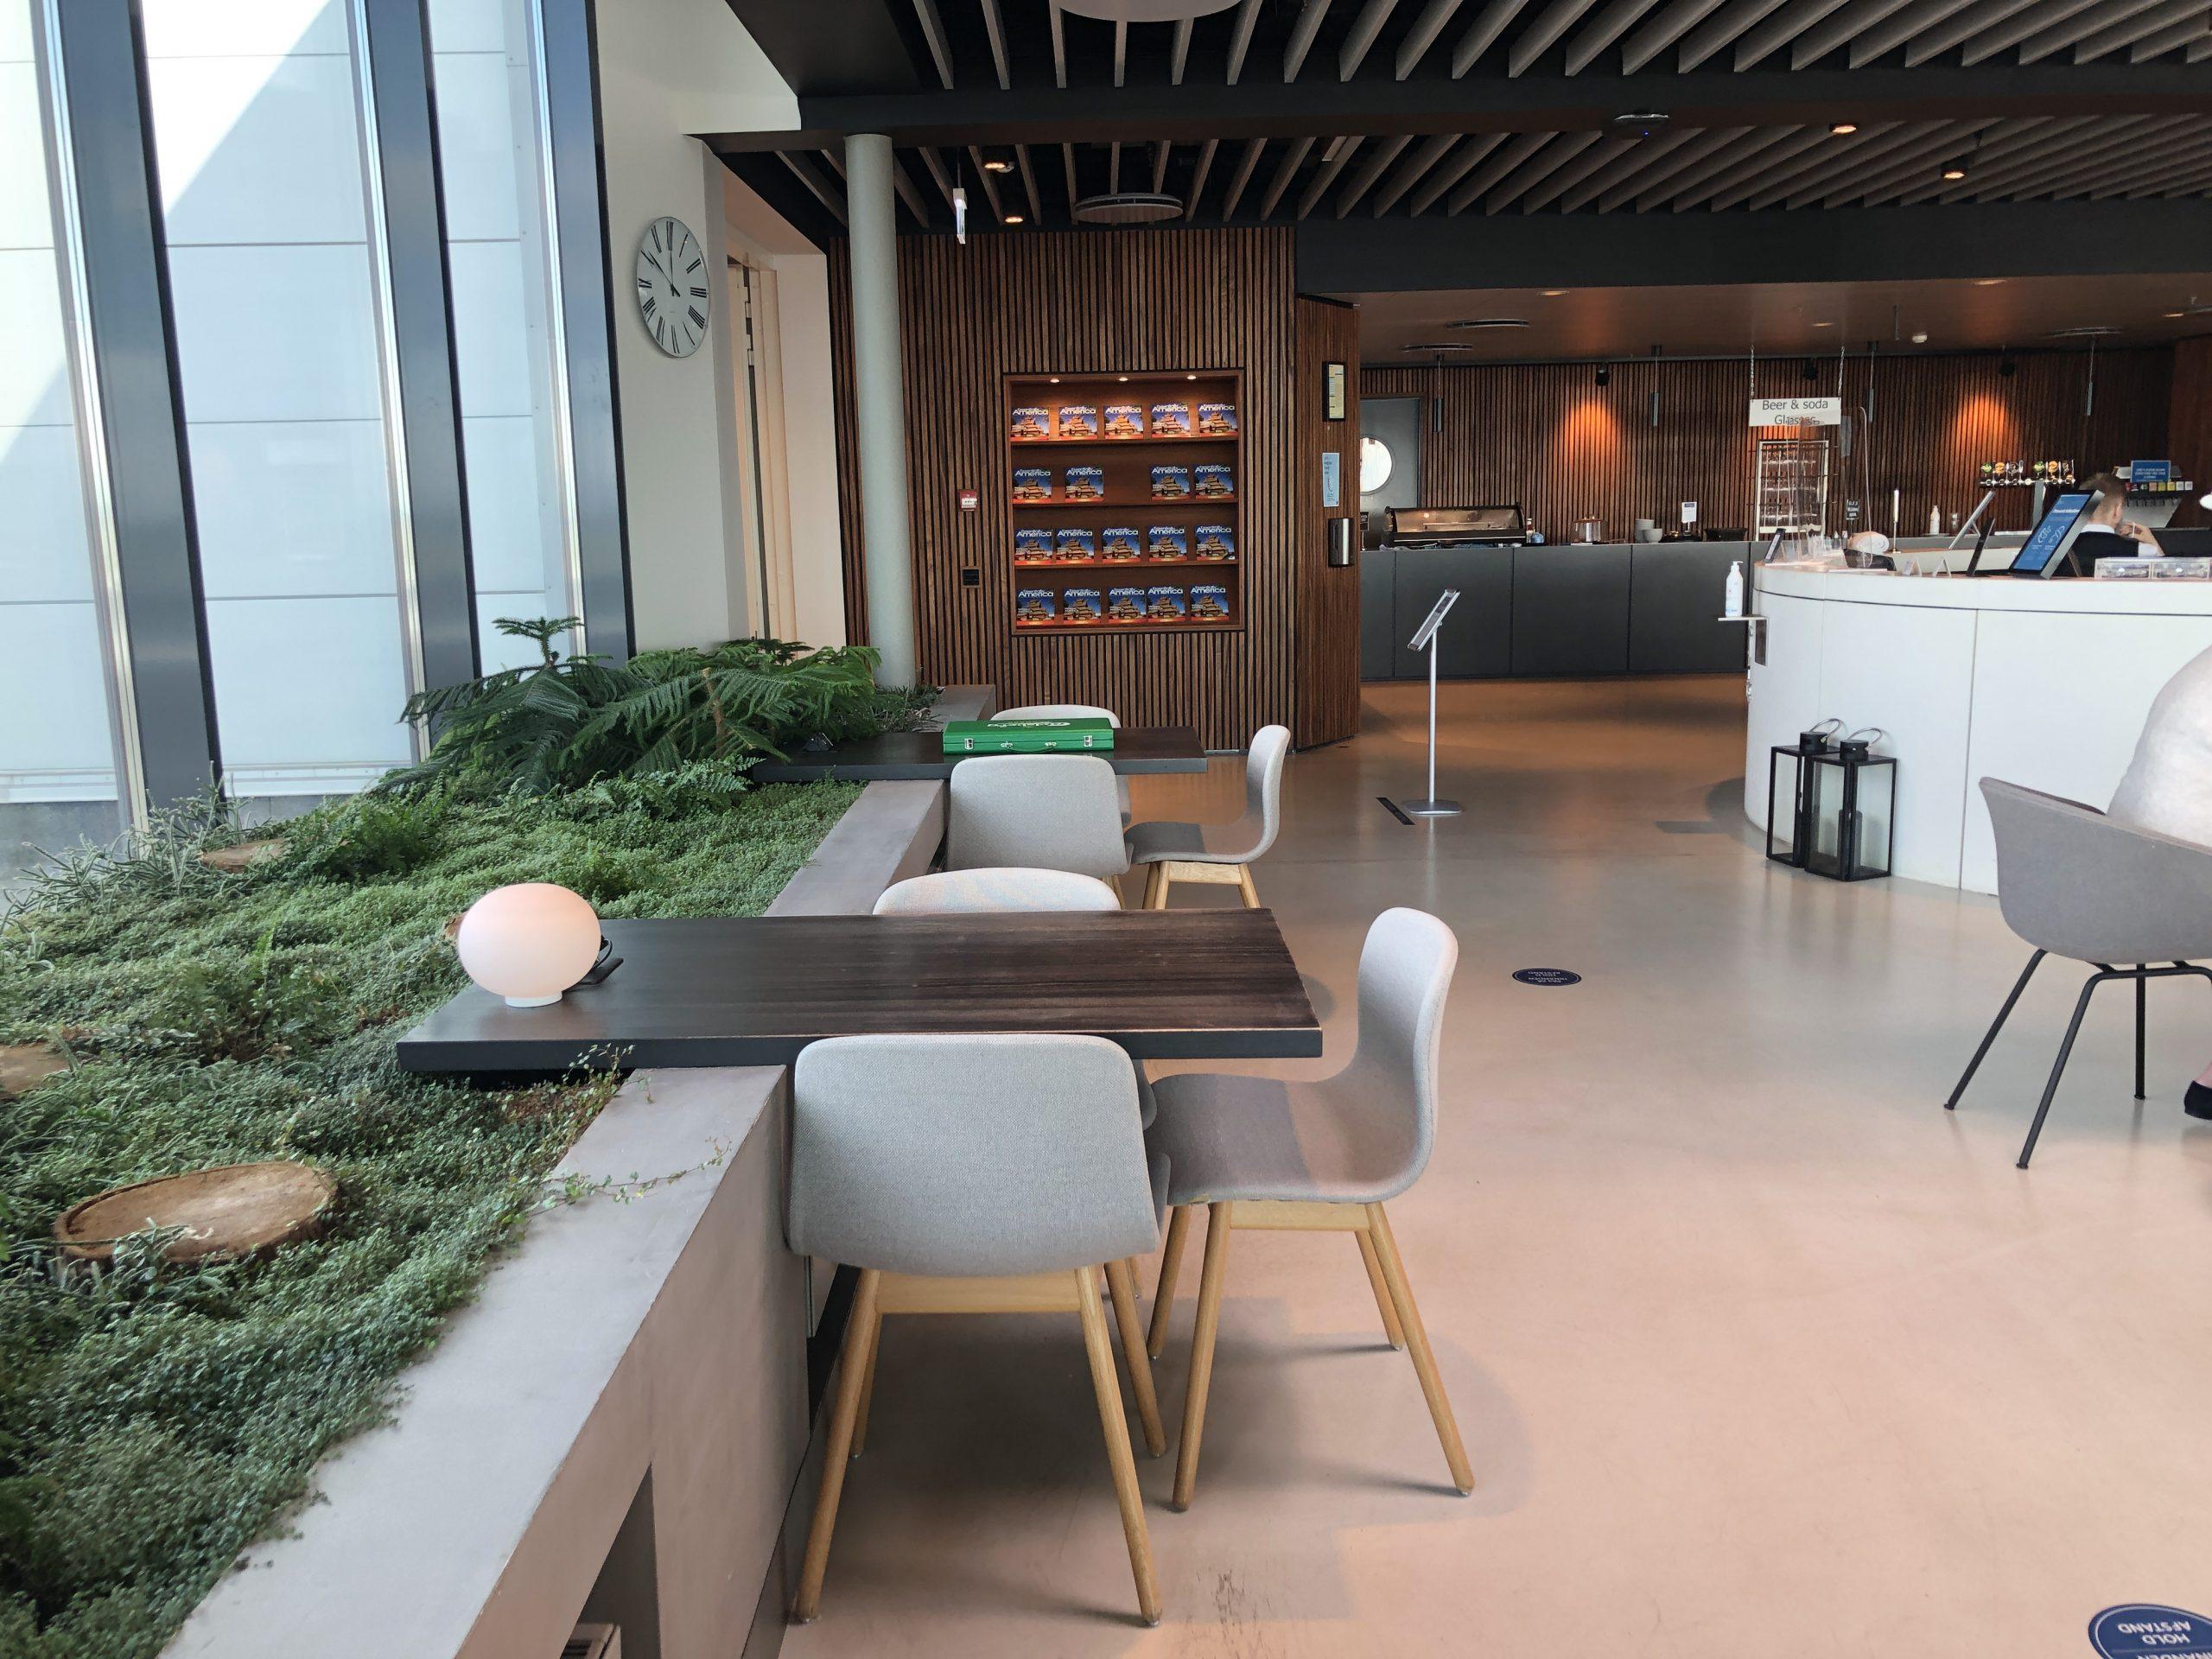 Lounge Review : コペンハーゲン空港(CPH) Eventyr Lounge